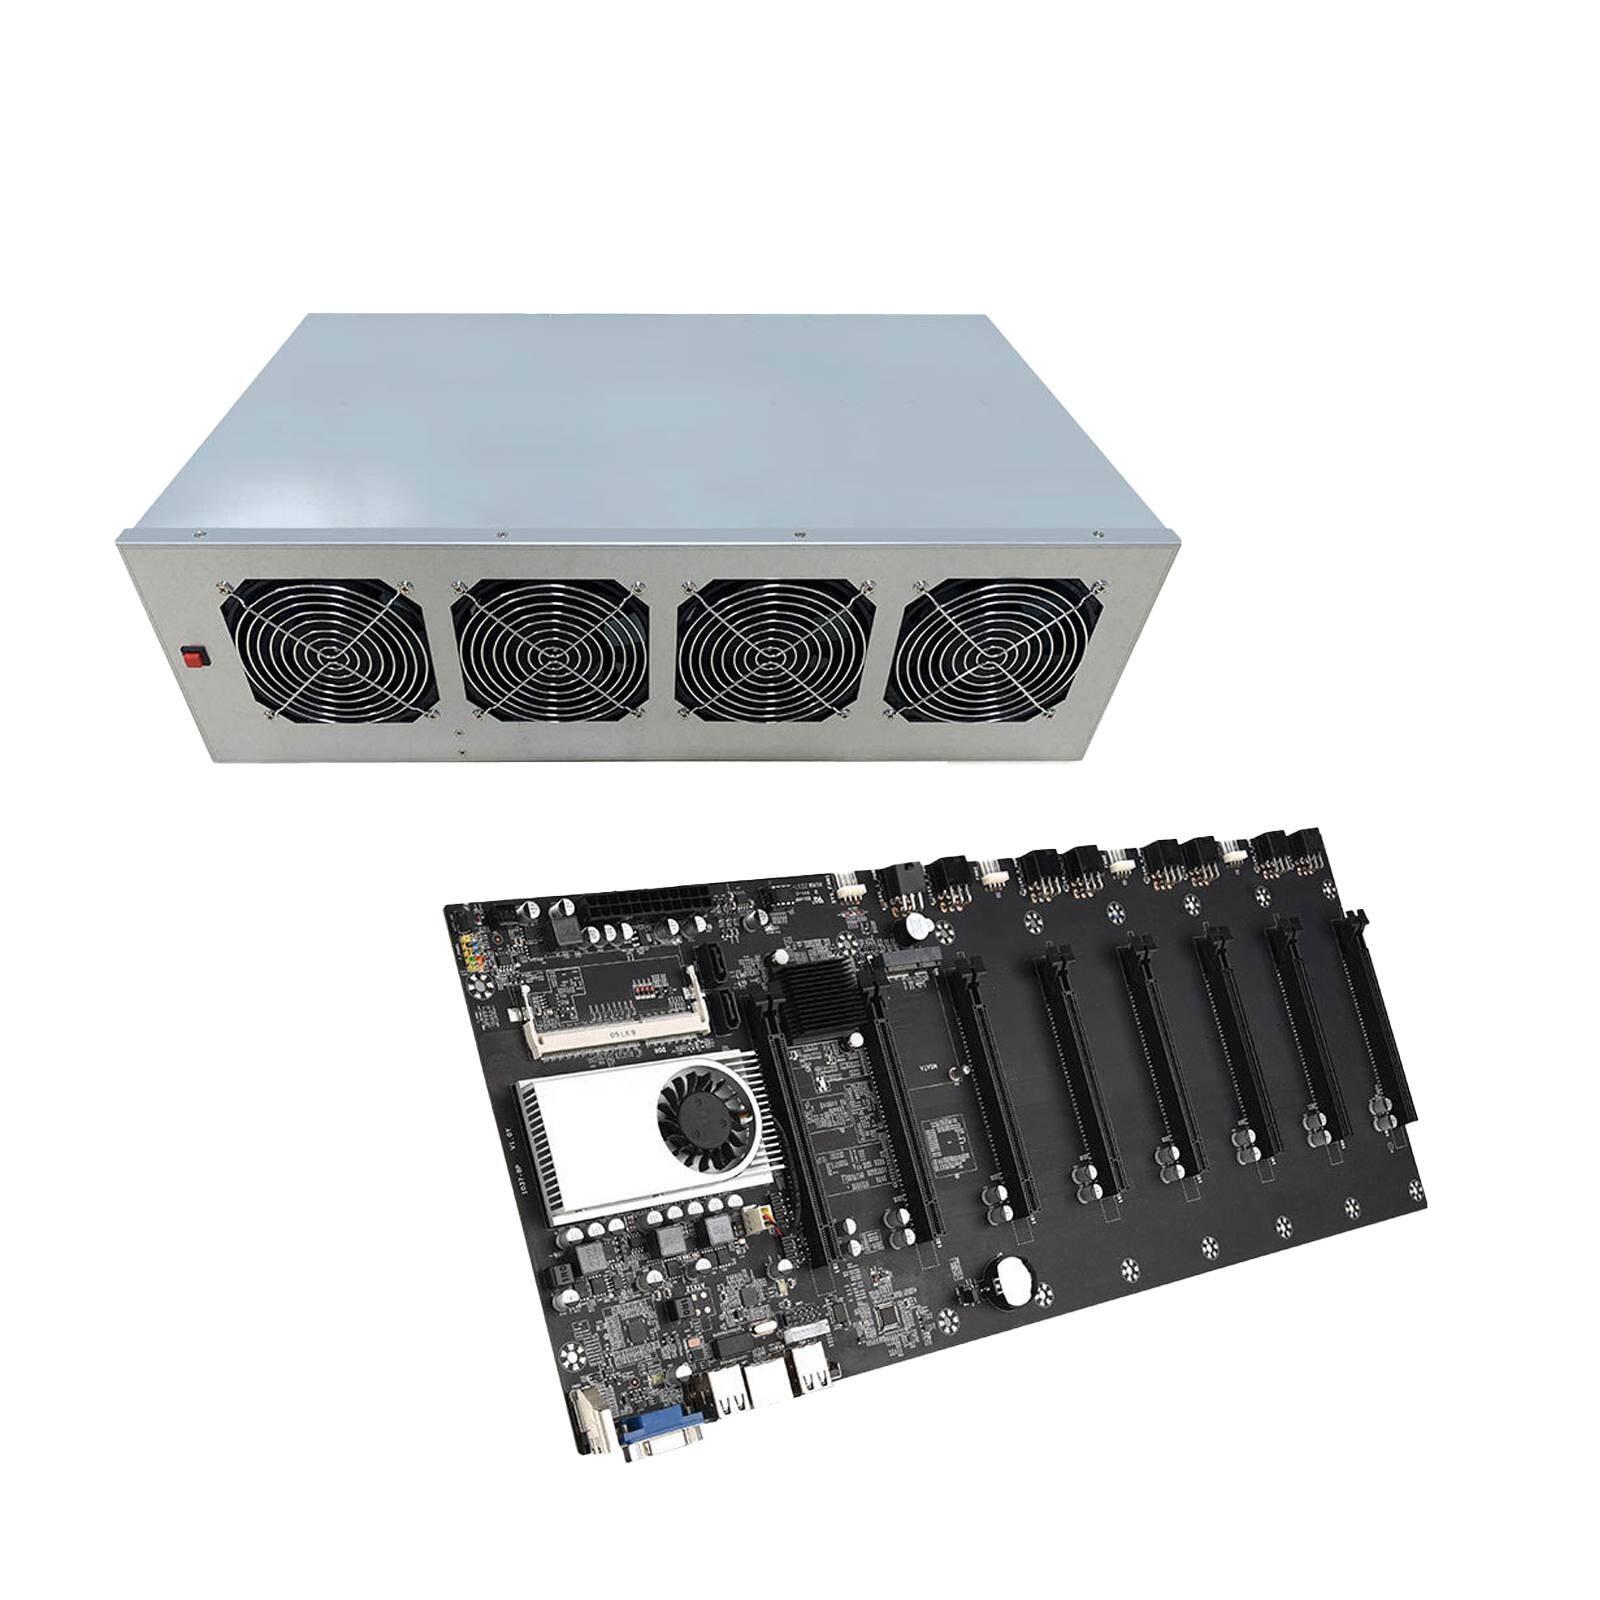 8GPU видеокарта BTC-T37 добыча материнская плата VGA 8PCIE 16X Поддержка 1066/1333/1600 МГц DDR3/DDR3L Майнер Motherbaord + коробка